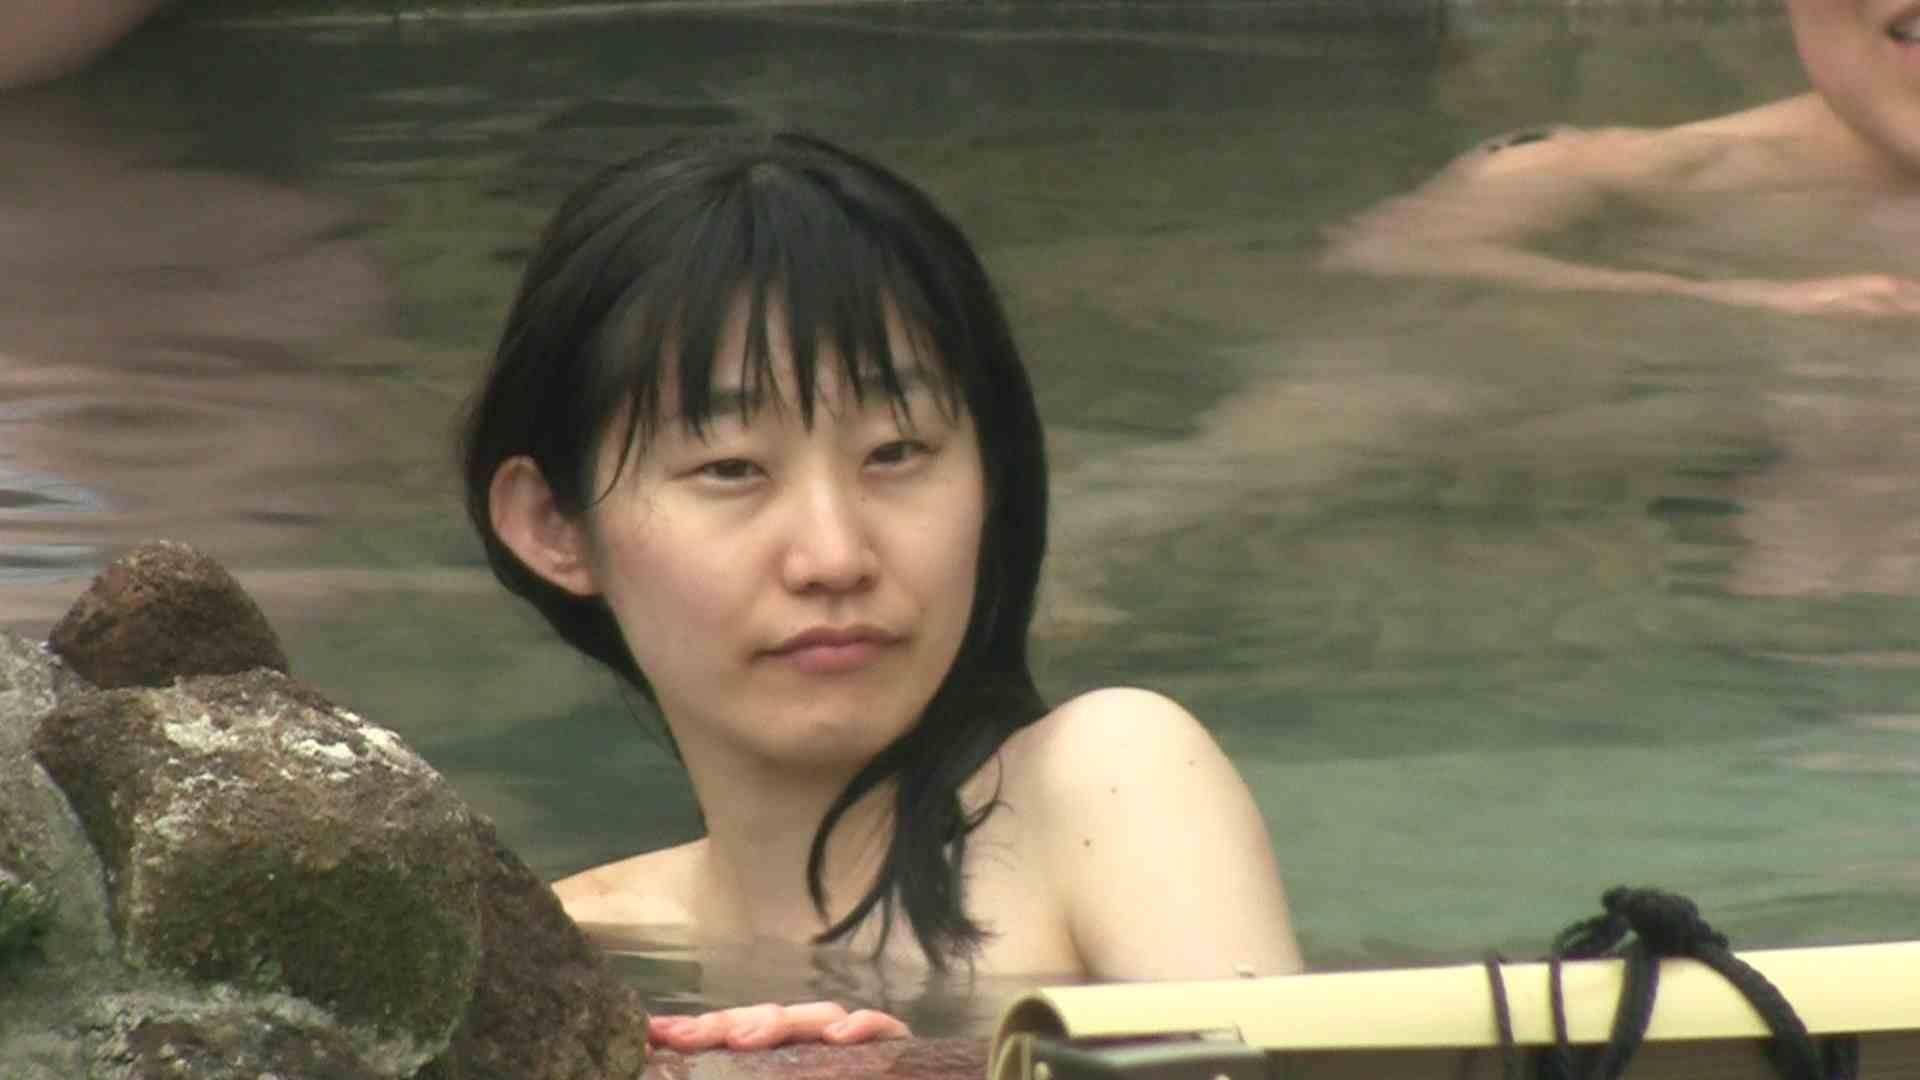 Aquaな露天風呂Vol.14【VIP】 盗撮シリーズ   露天風呂編  94PIX 35